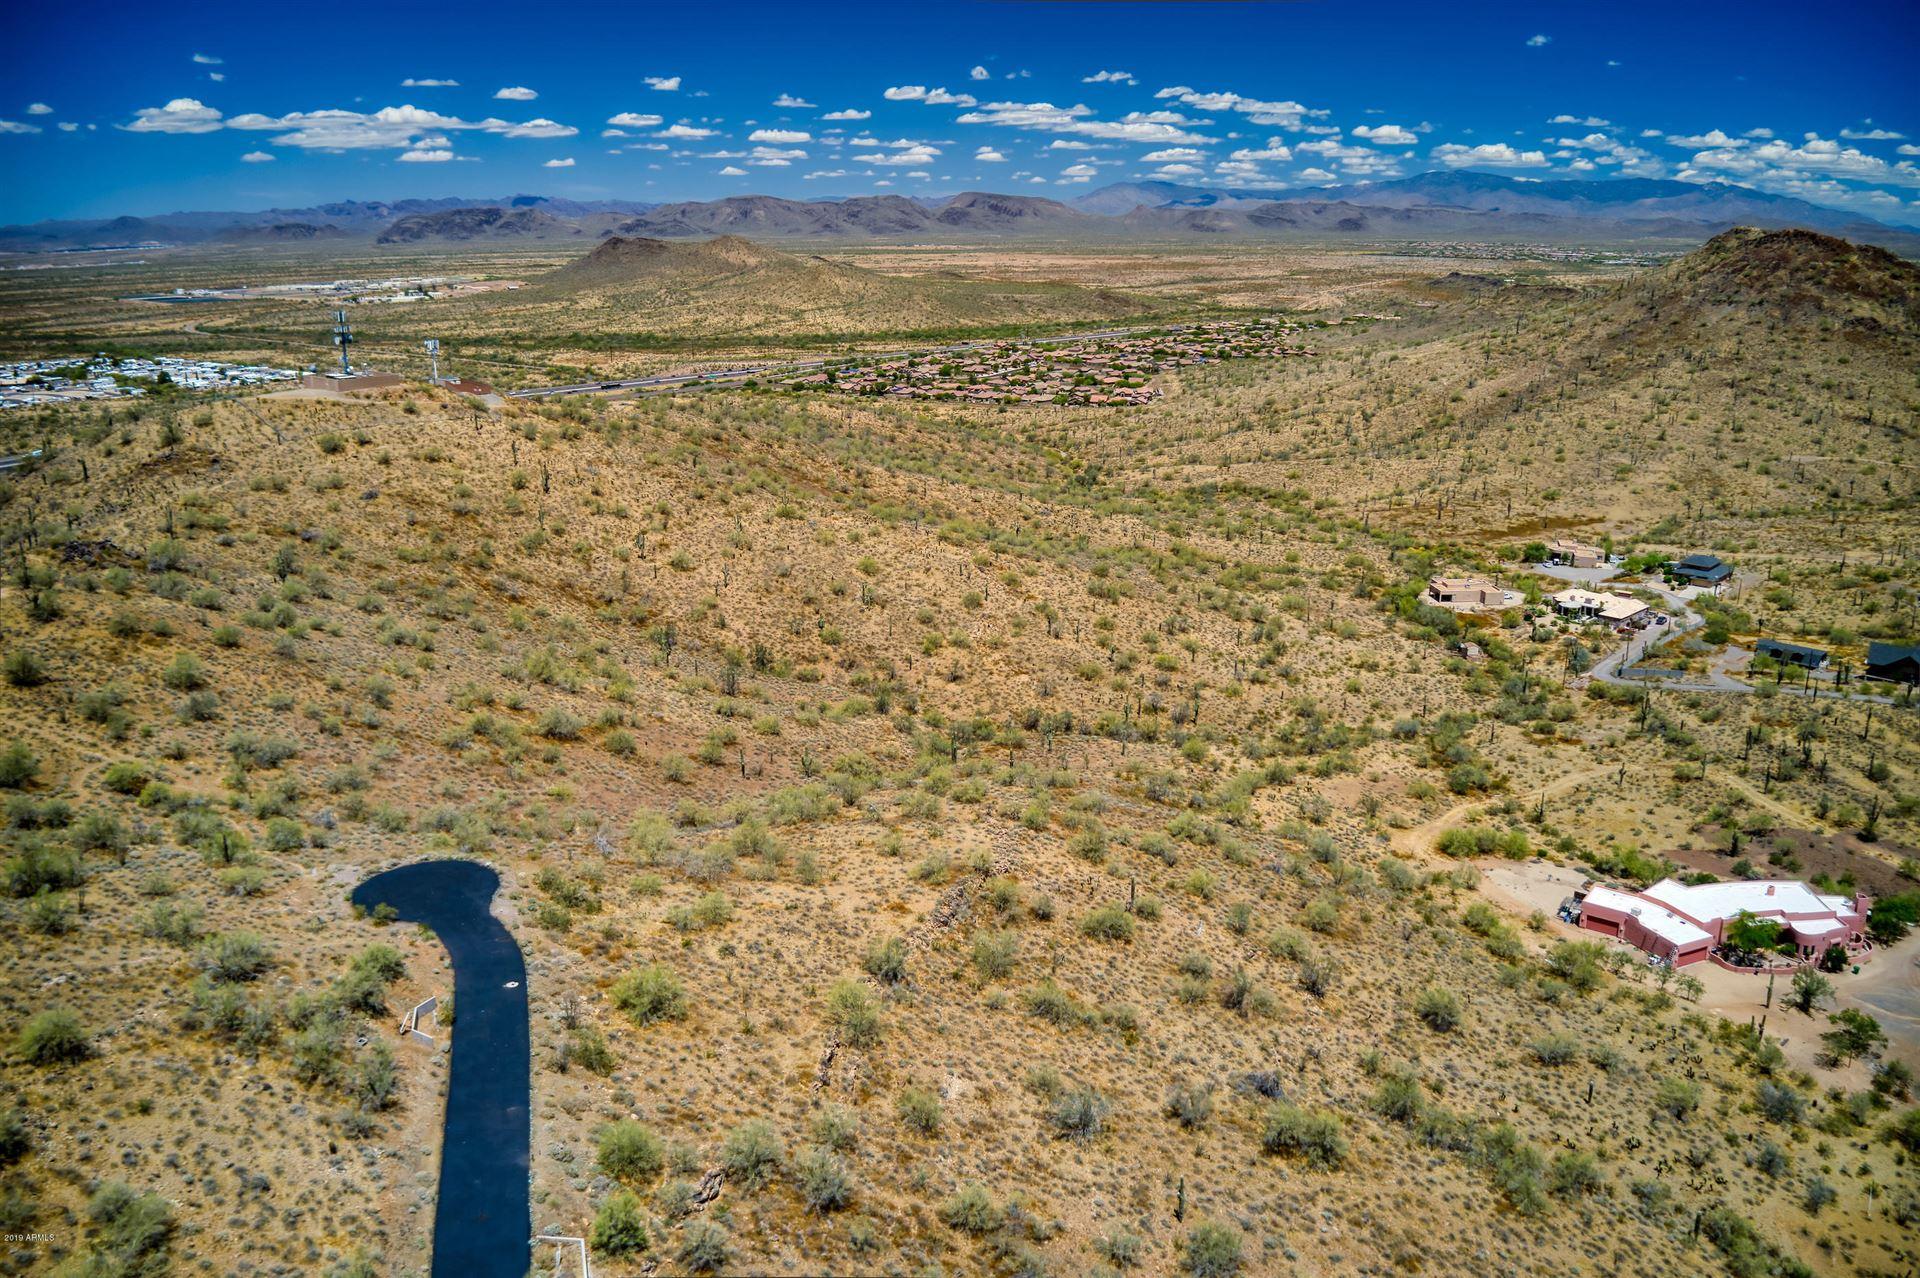 Photo of 3416 W Rambling Road, Desert Hills, AZ 85086 (MLS # 5318840)